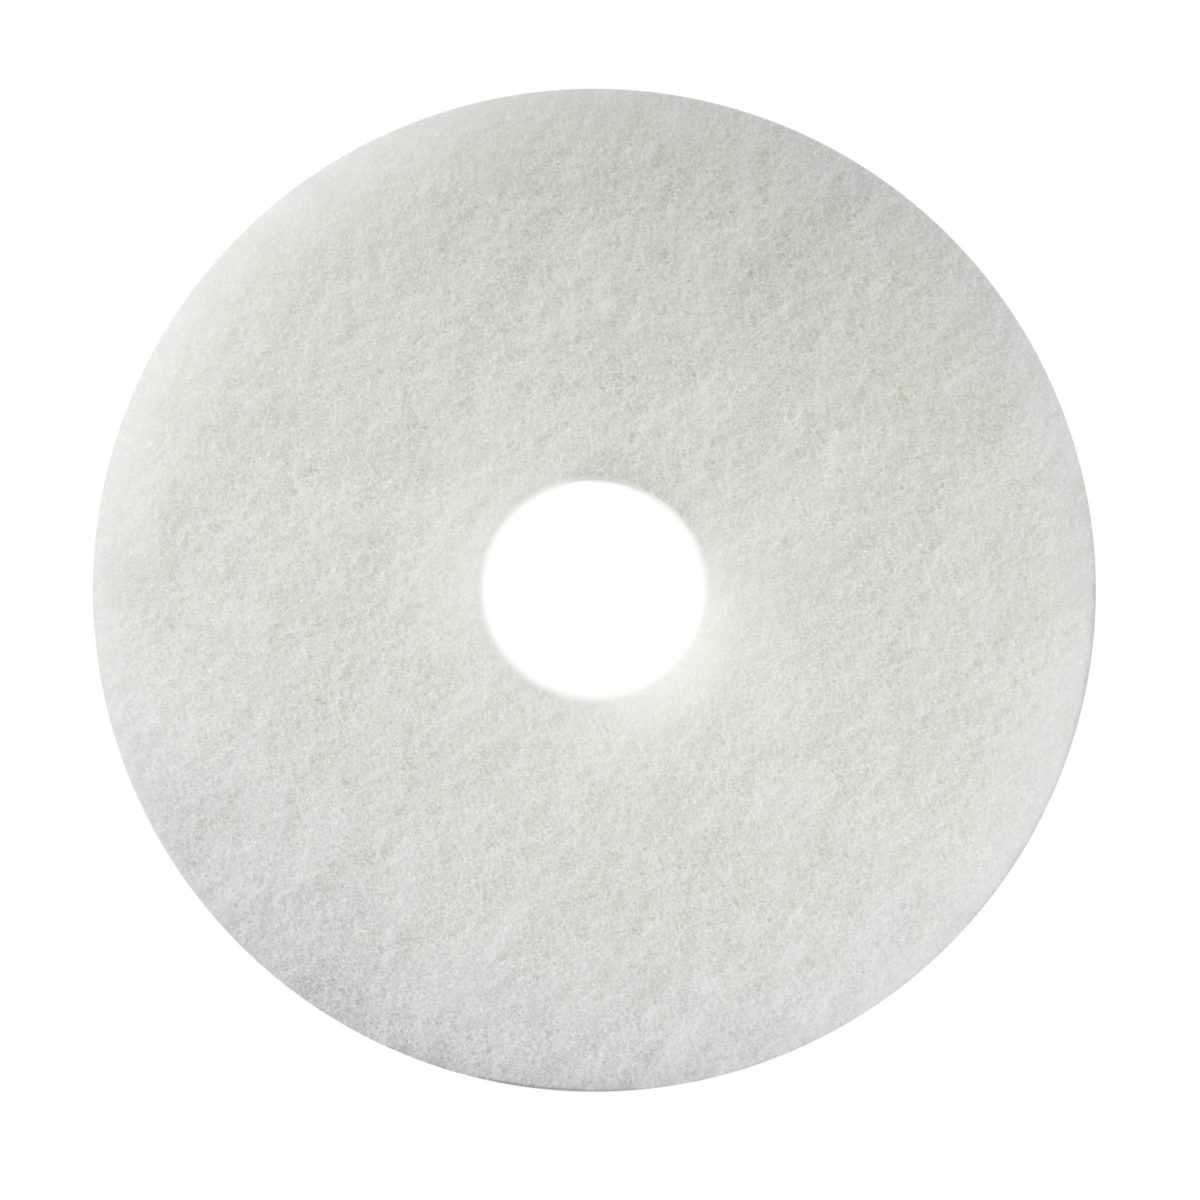 floorpad biały